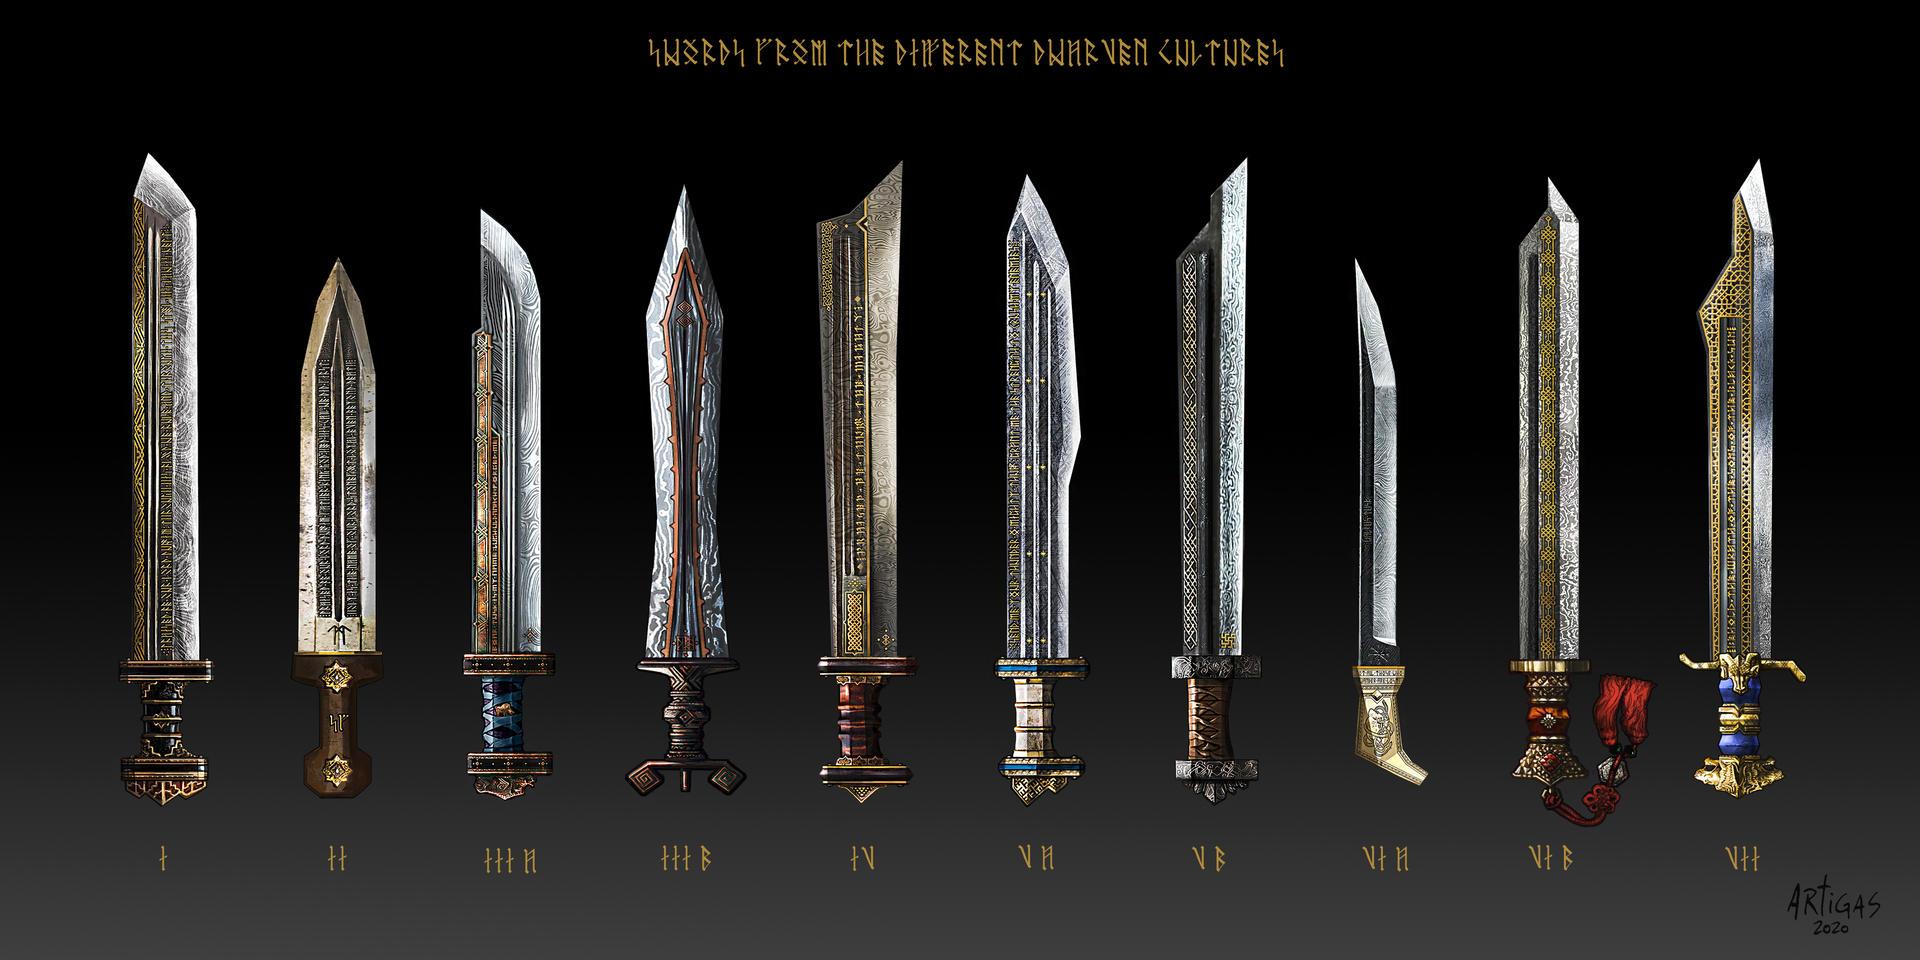 Swords of the various Dwarven cultures